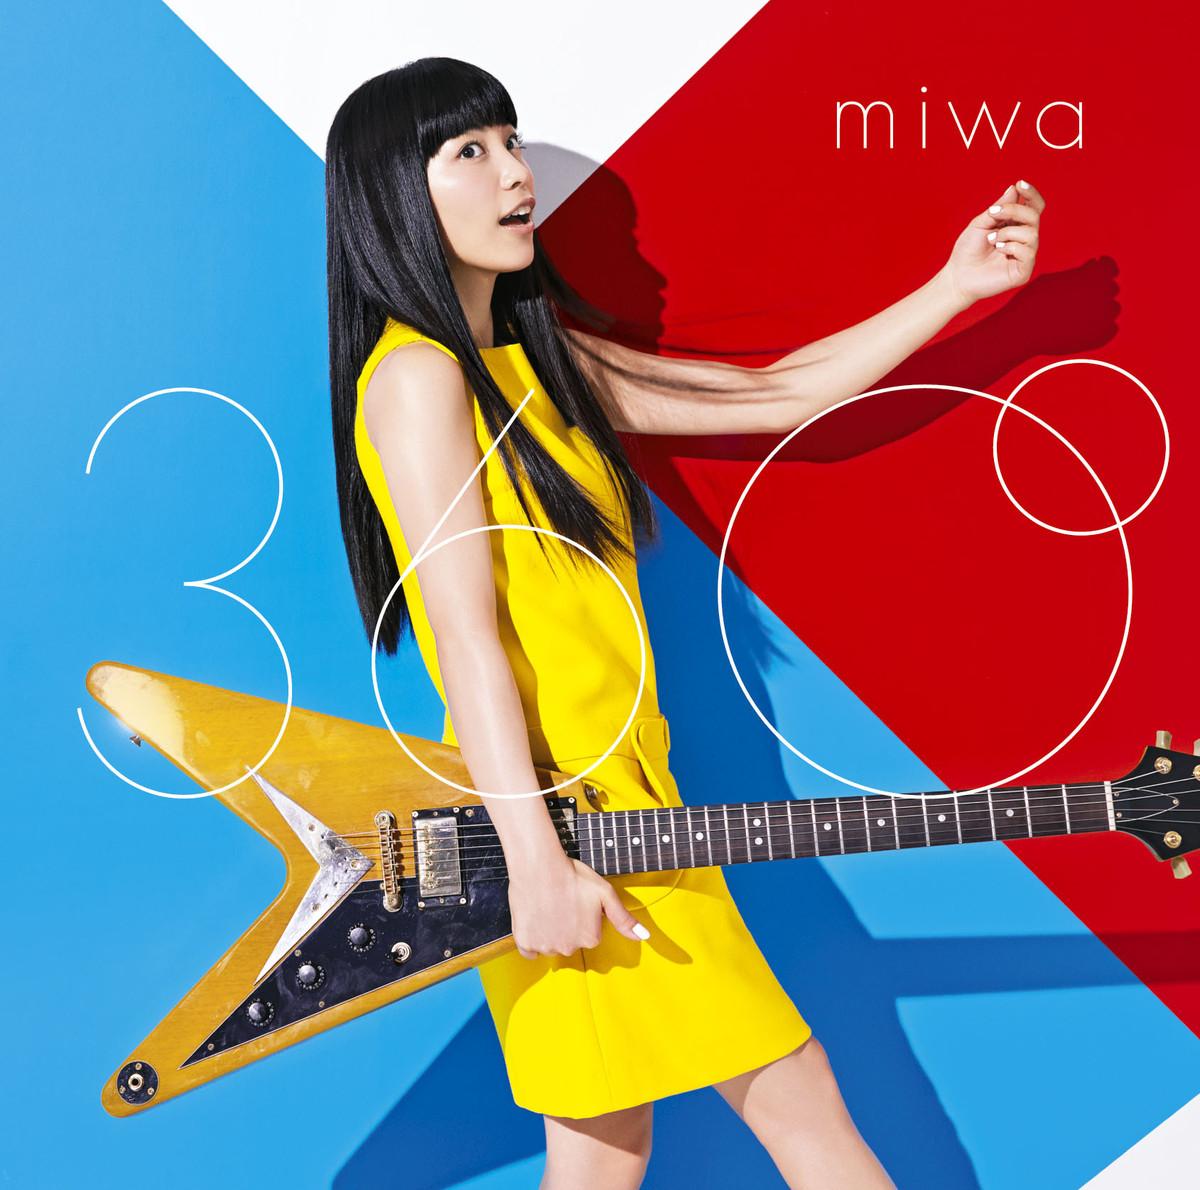 20151118.02 miwa - 360 Degree cover 1.jpg